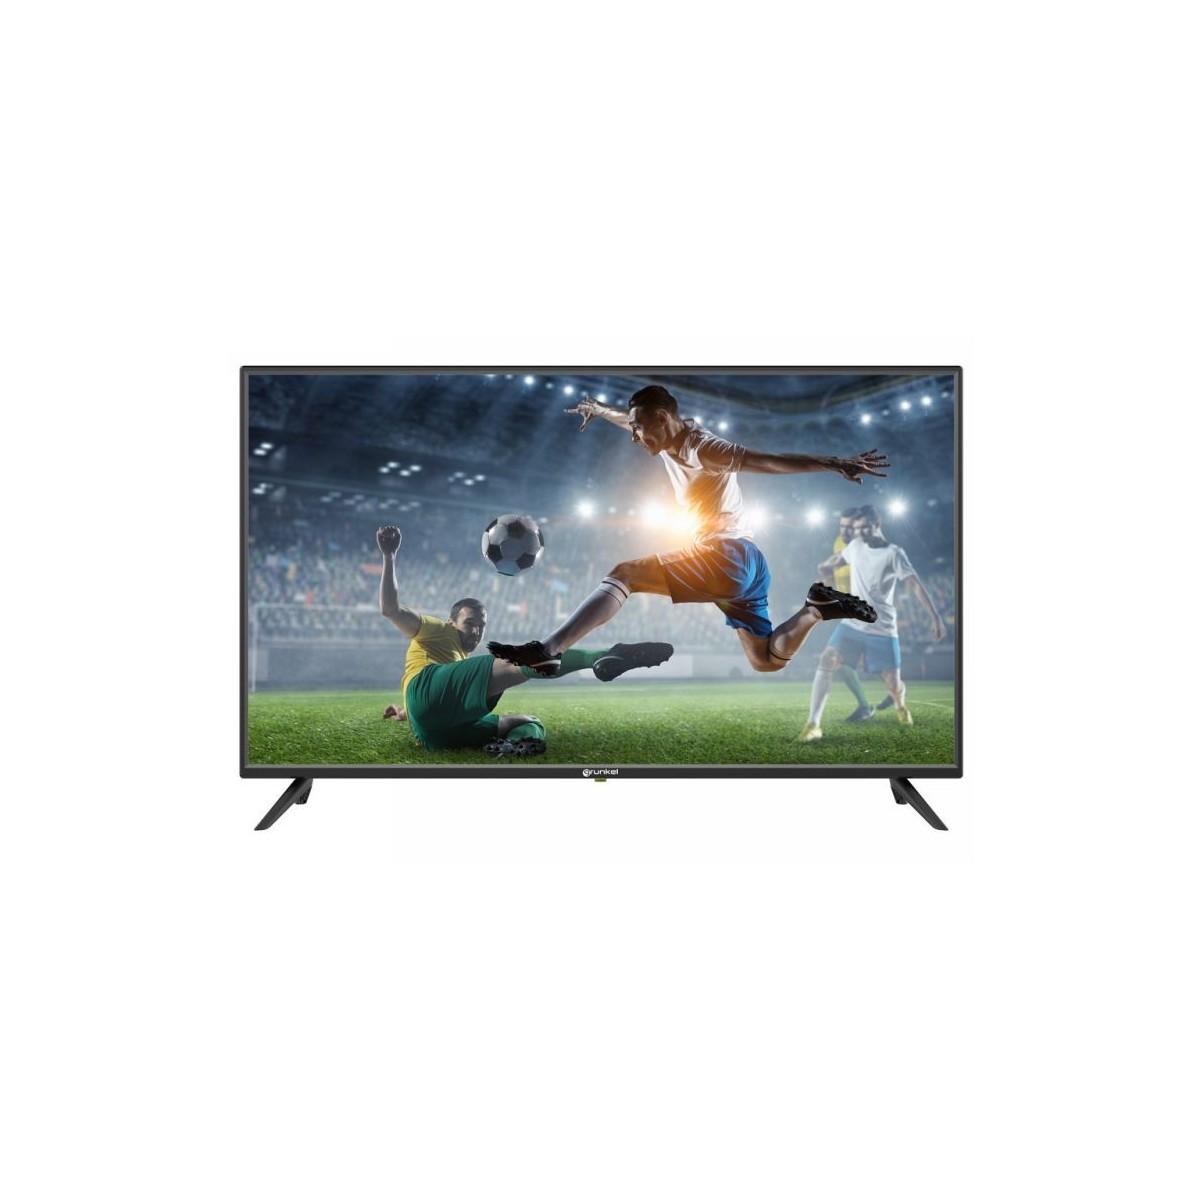 TV Led GRUNKEL LED-4020T2 tdt2